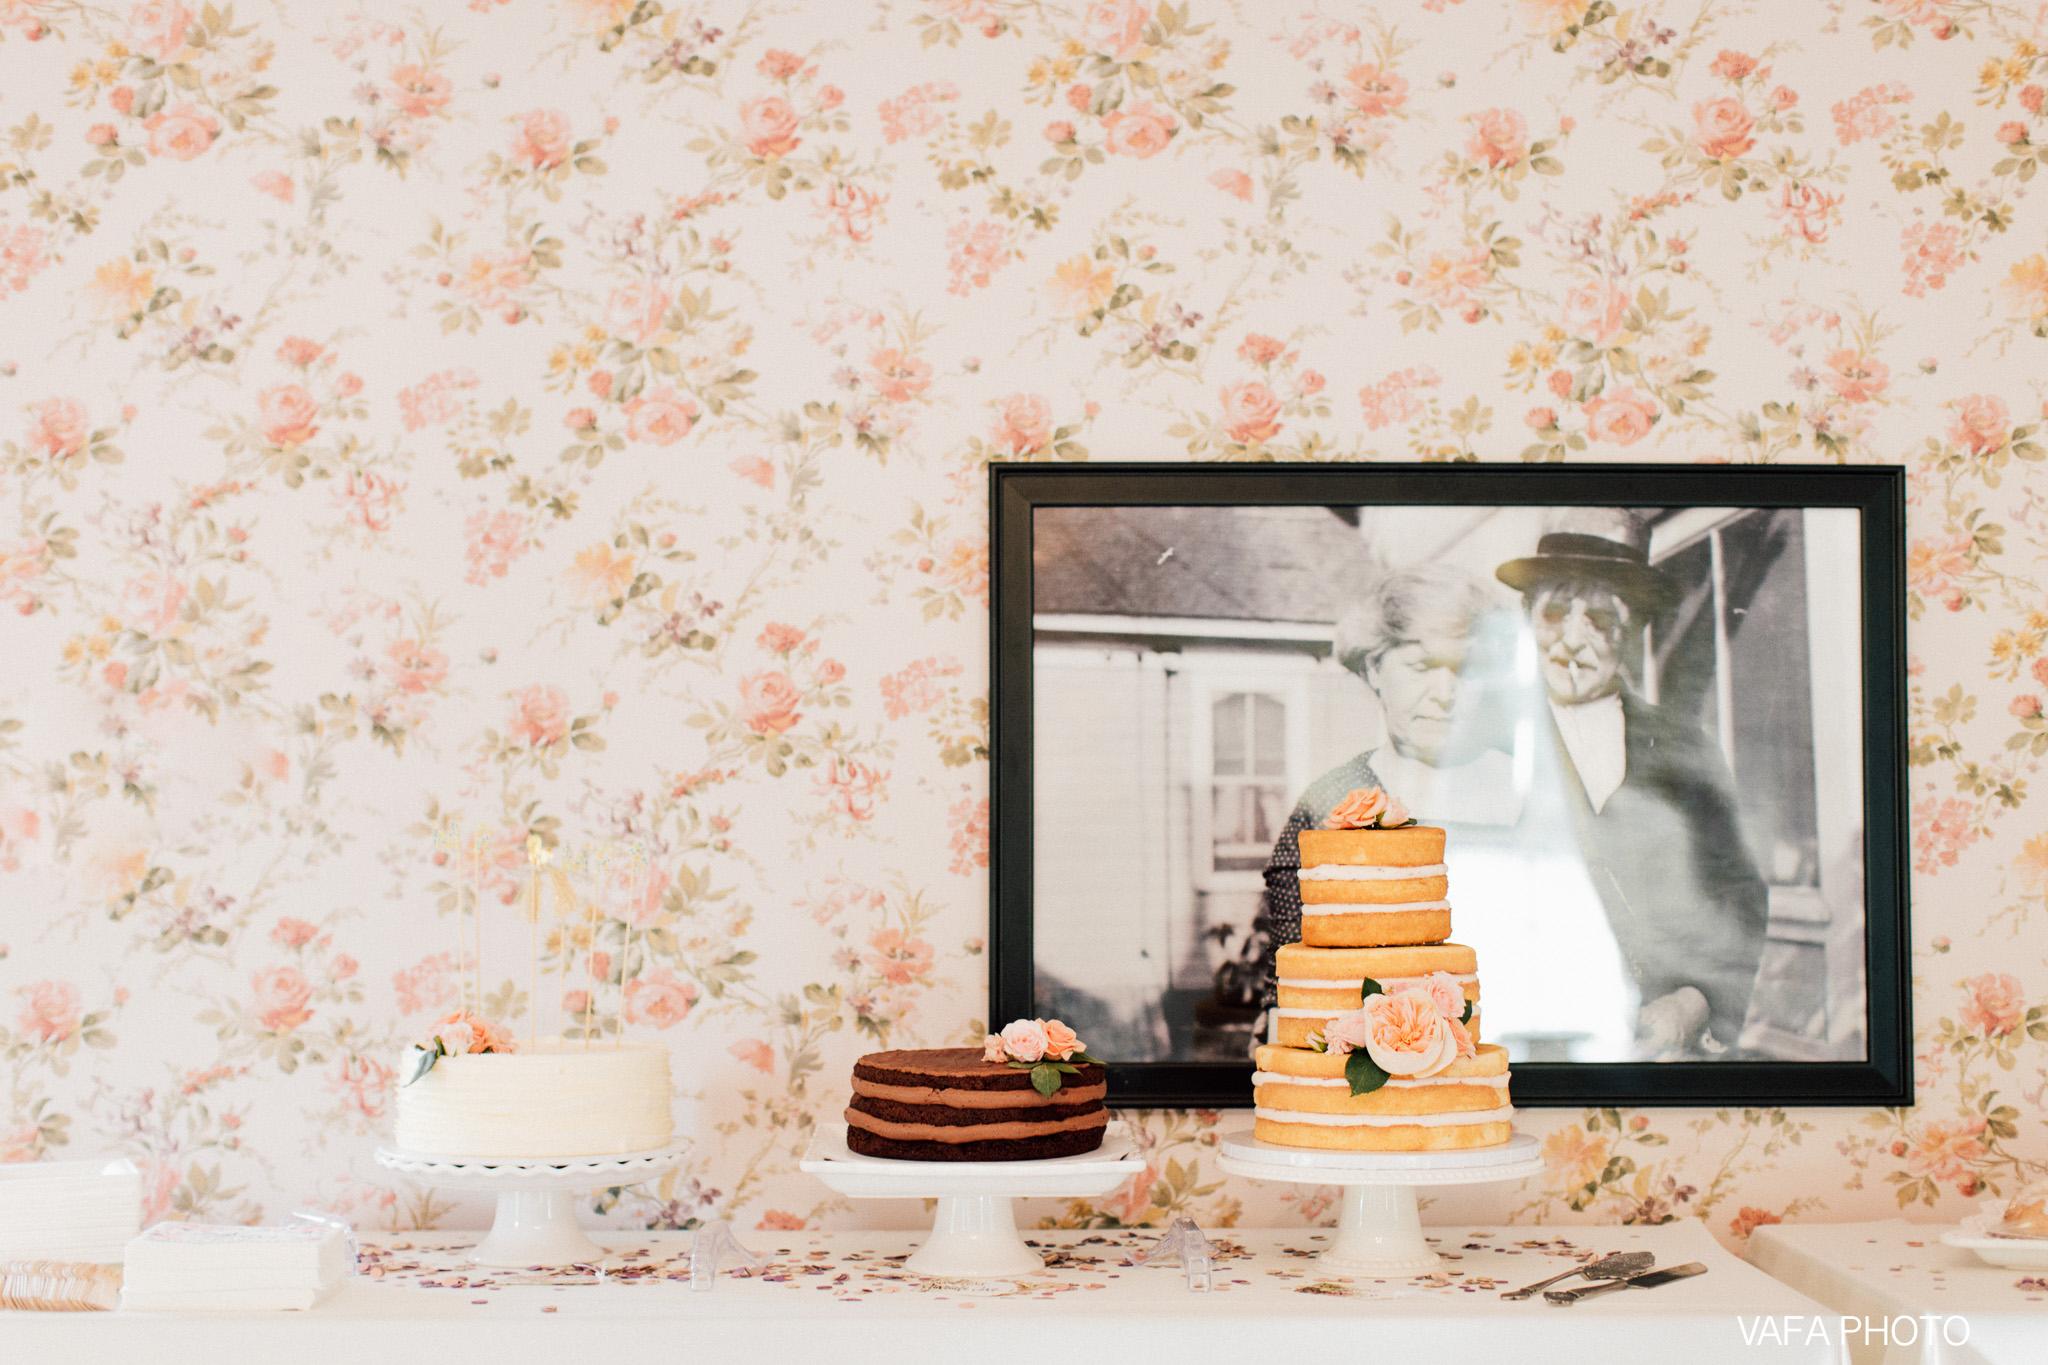 The-Felt-Estate-Wedding-Kailie-David-Vafa-Photo-799.jpg